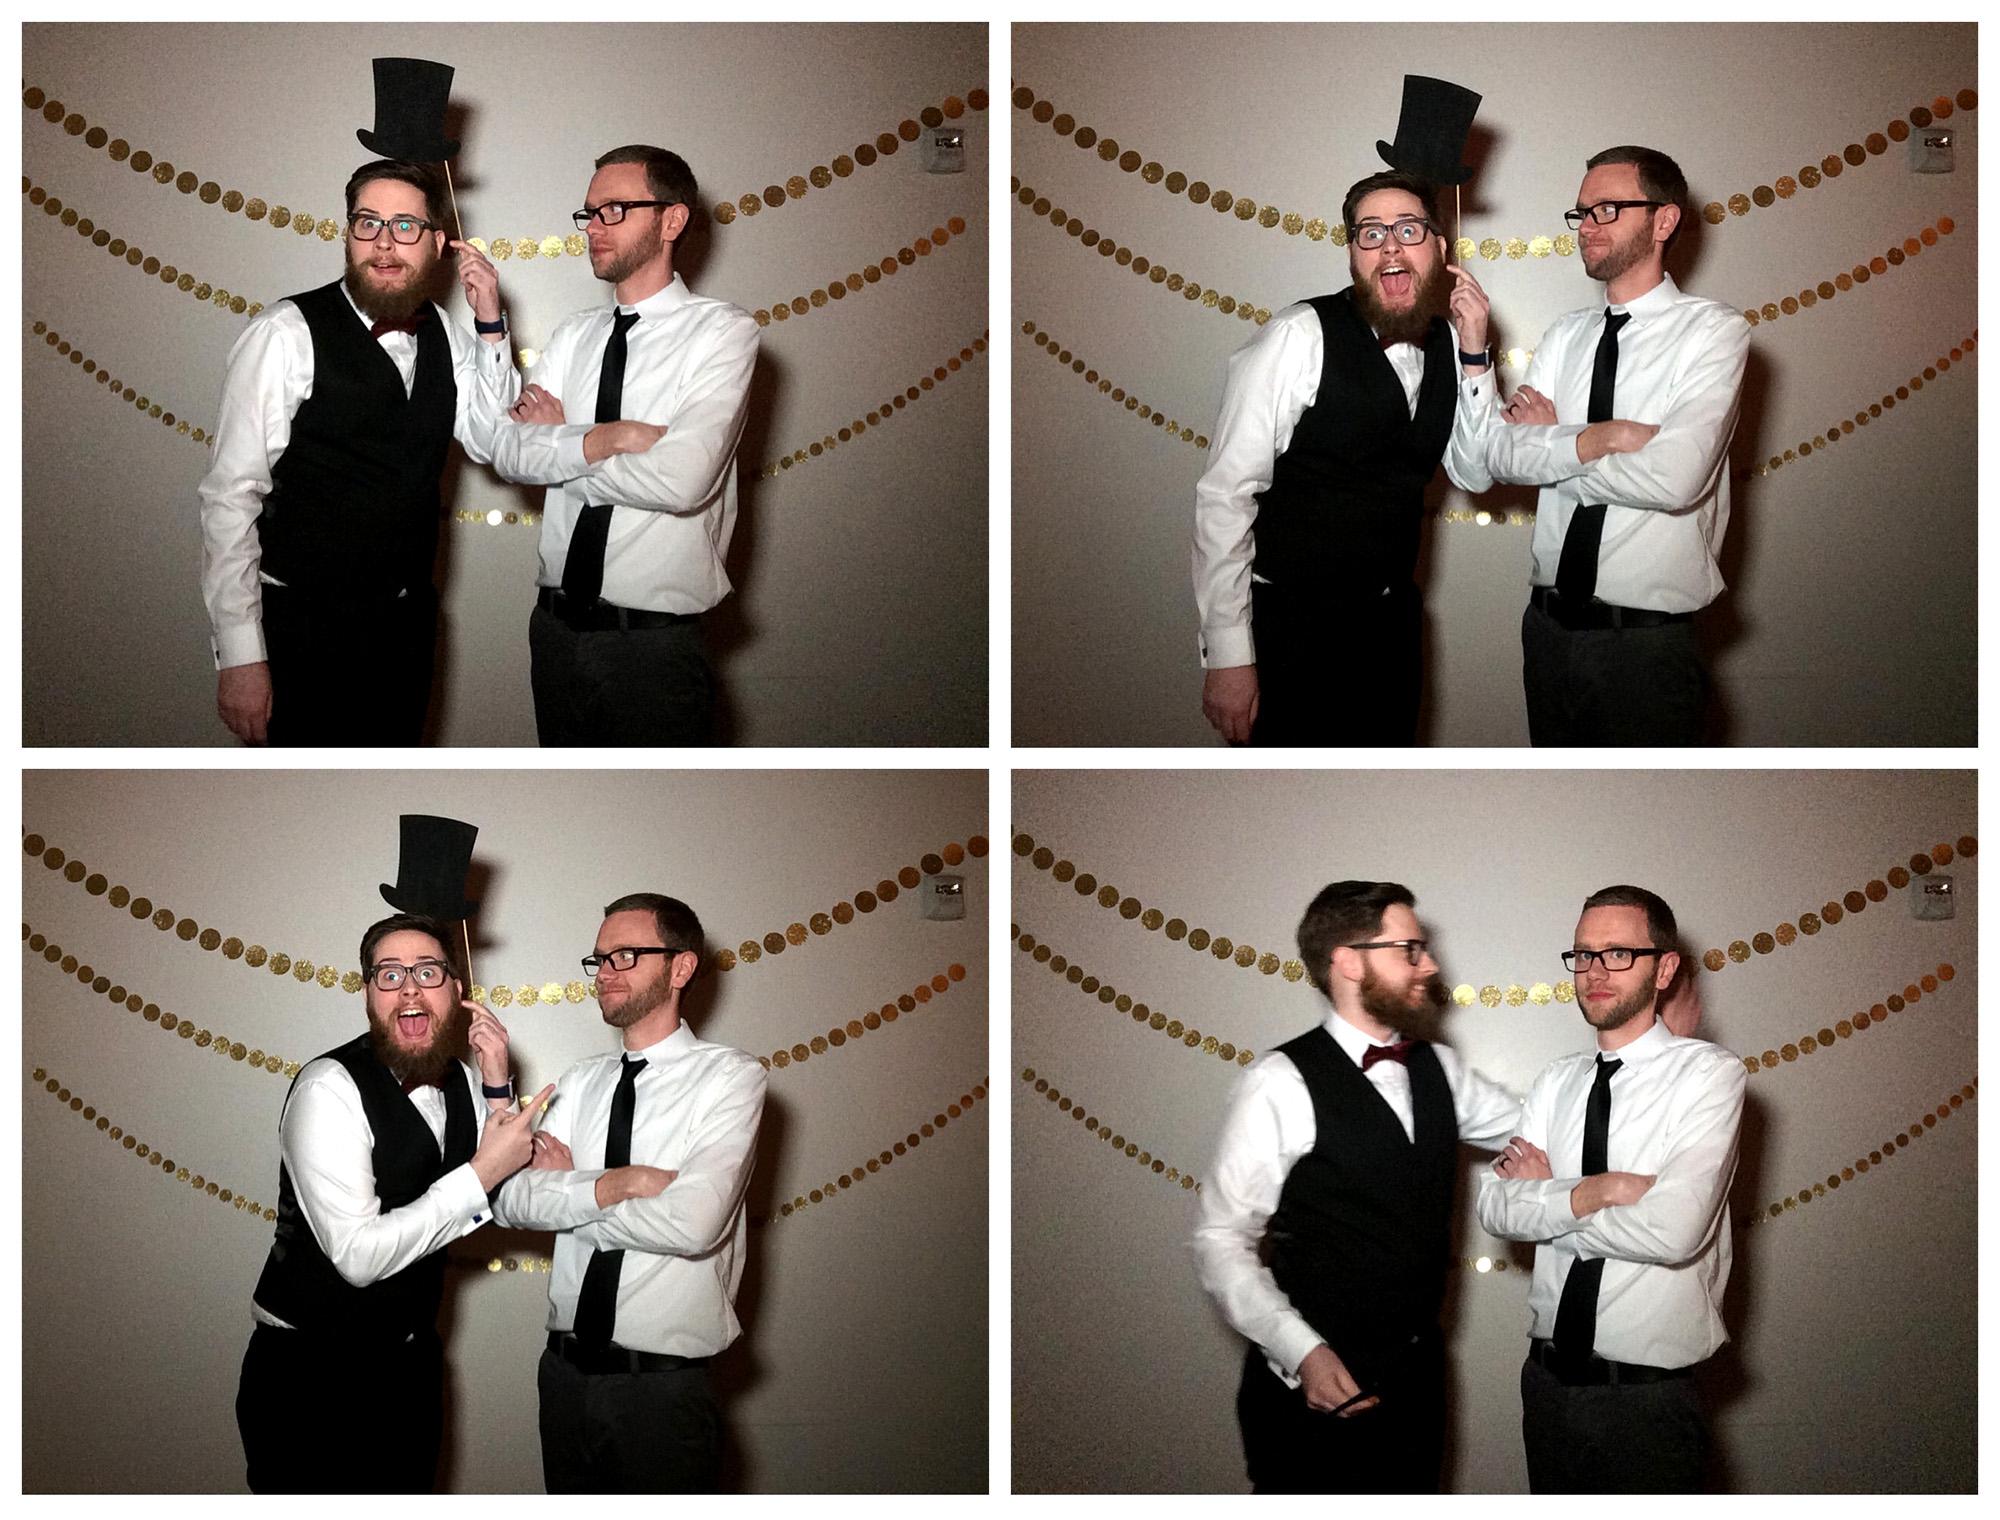 Myke Hurley and Stephen Hackett